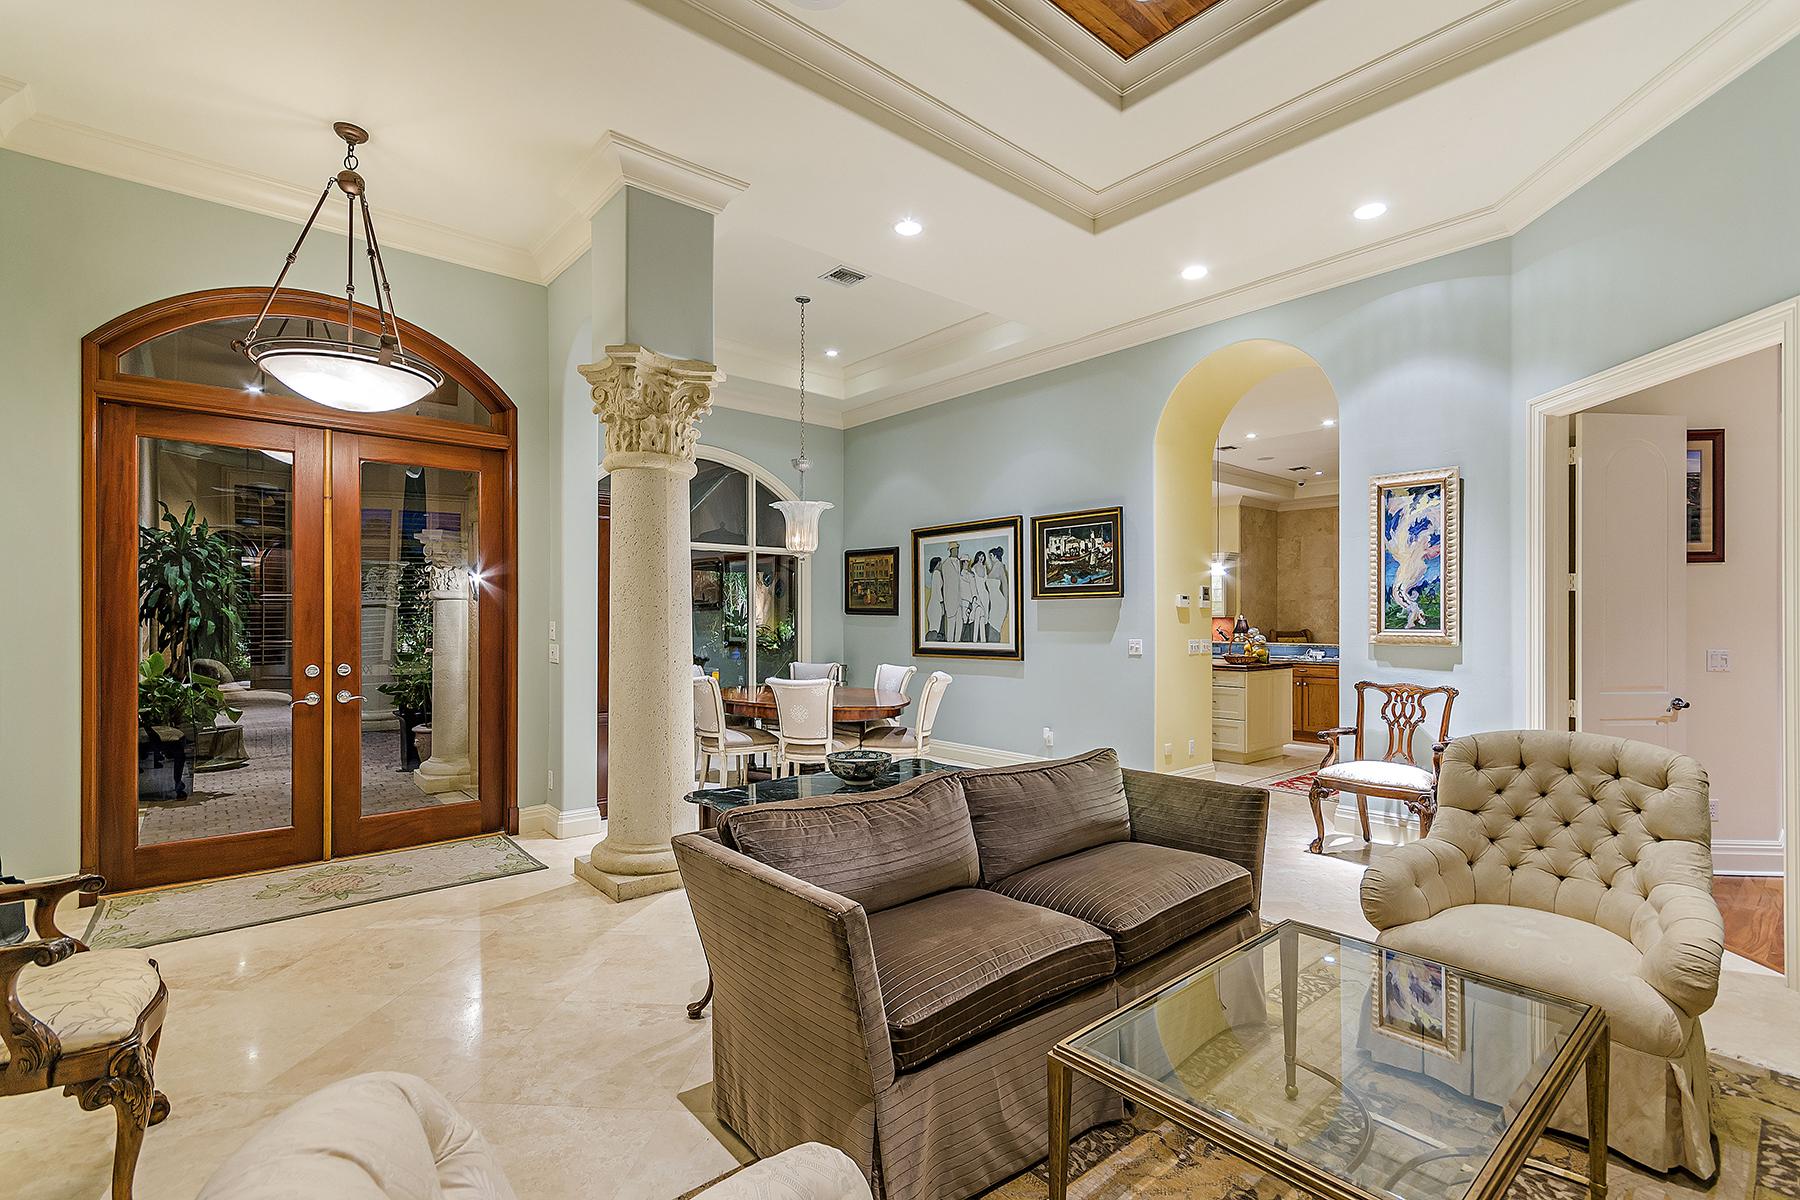 Additional photo for property listing at KENSINGTON GARDENS 2929  Gardens Blvd,  Naples, Florida 34105 United States